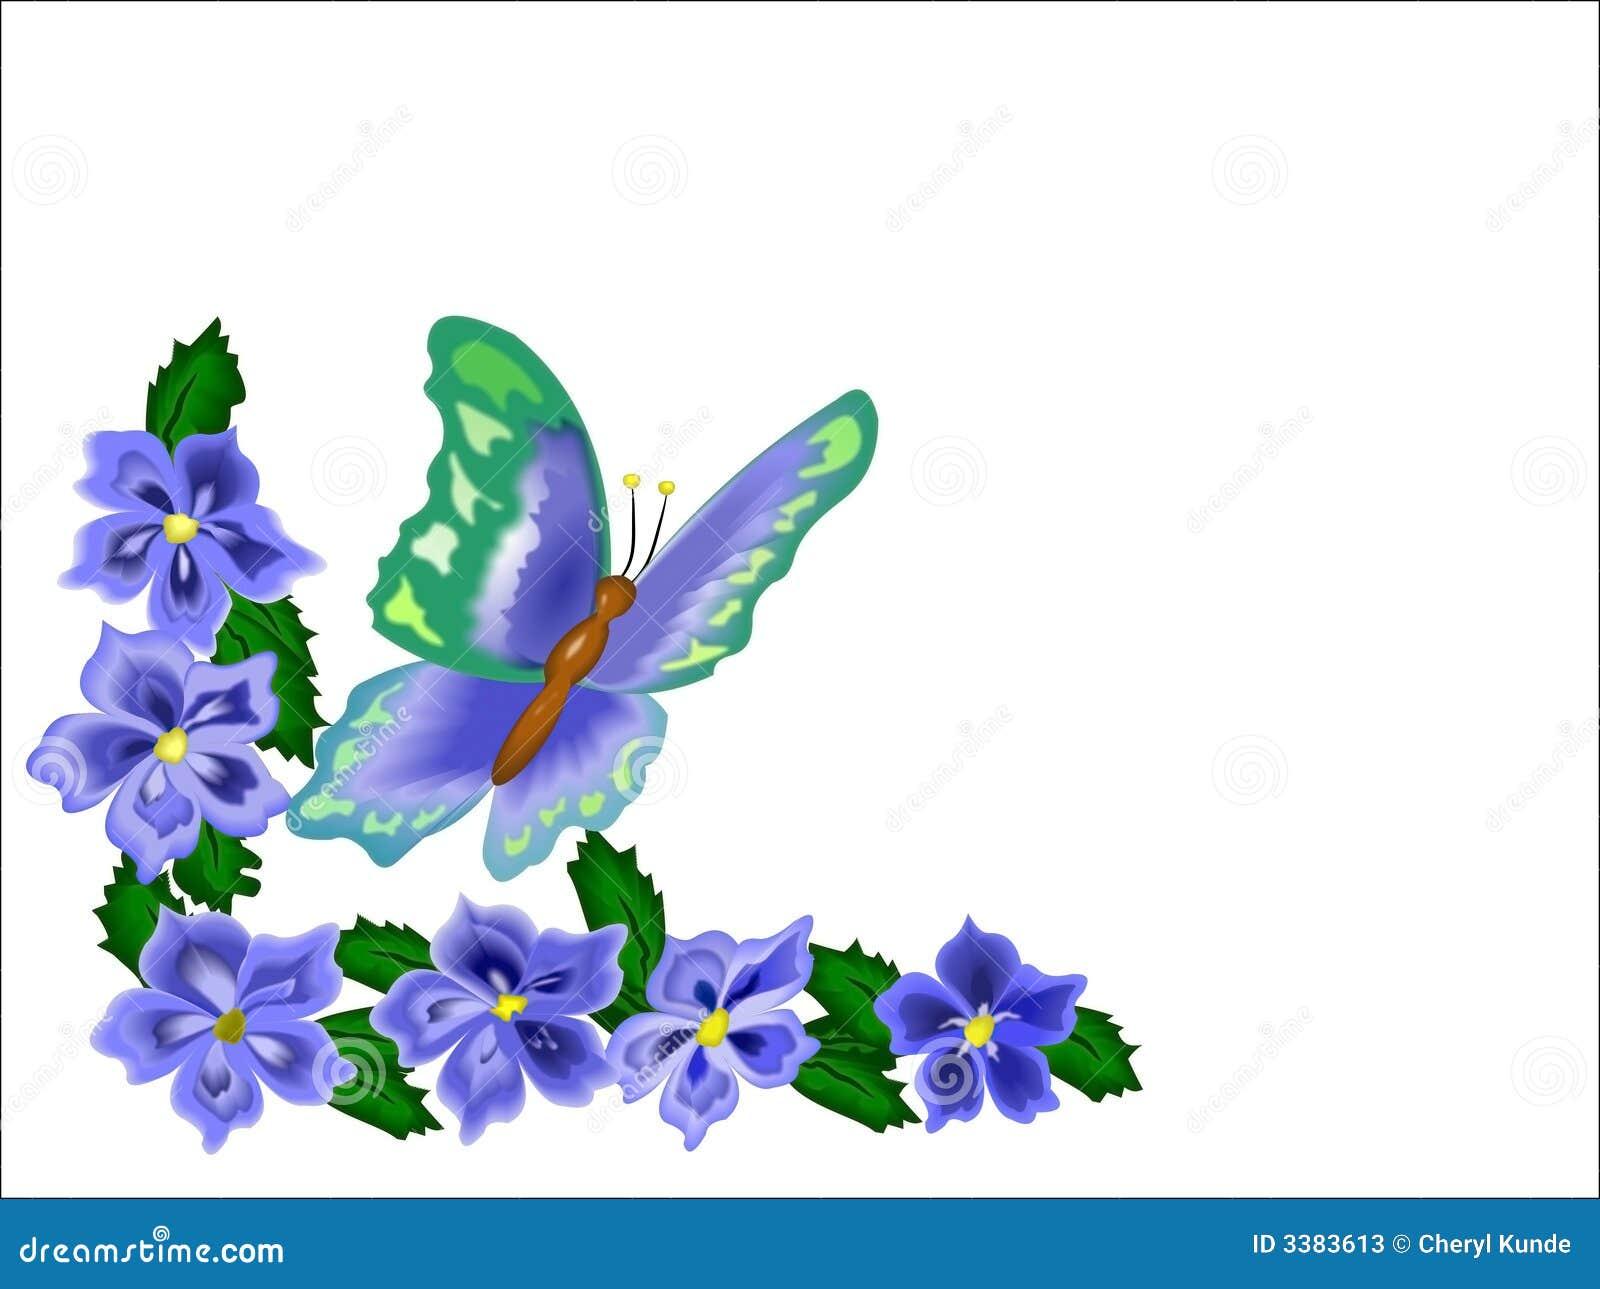 Butterfly Bat Clipart Black And White Www Bilderbeste Com